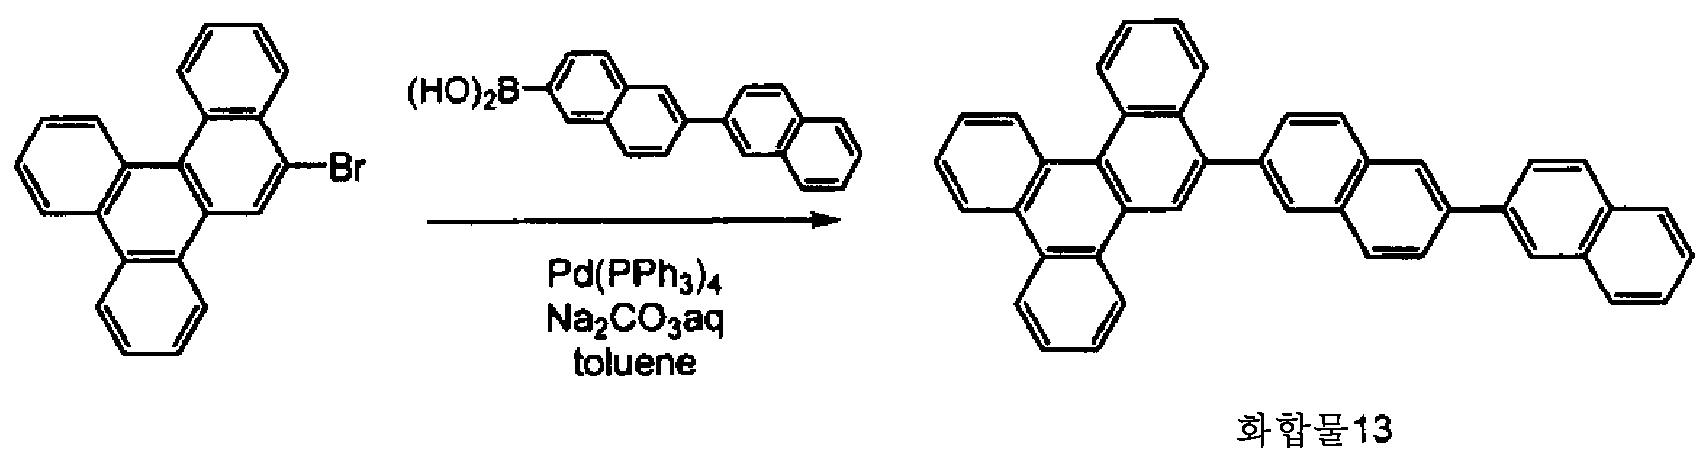 Figure 112010031772612-pct00062